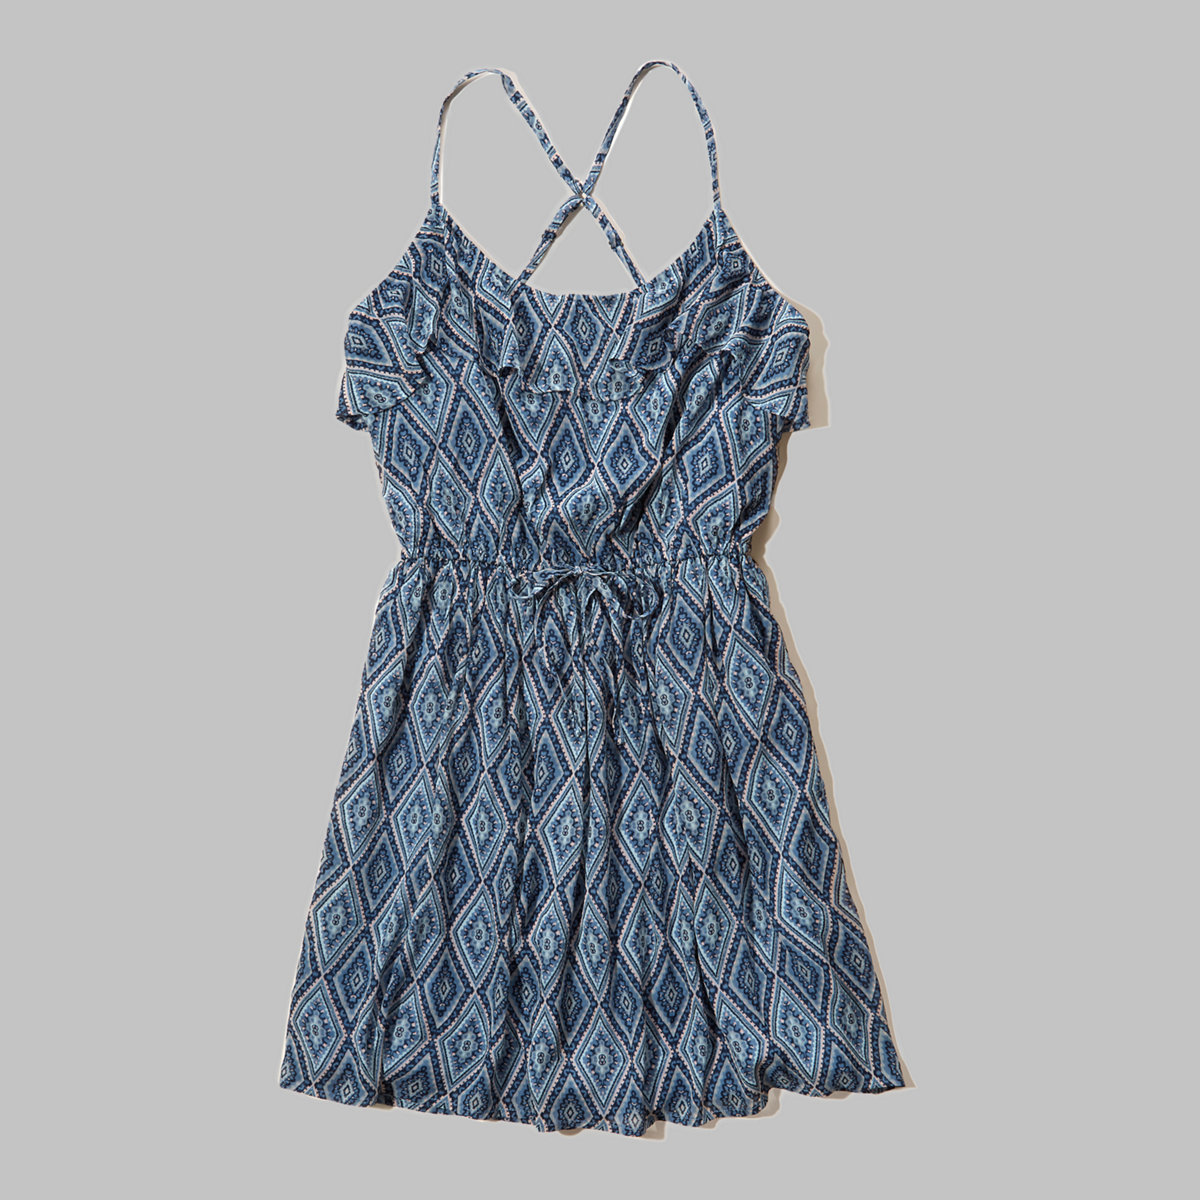 Ruffle Chiffon Easy Waist Dress